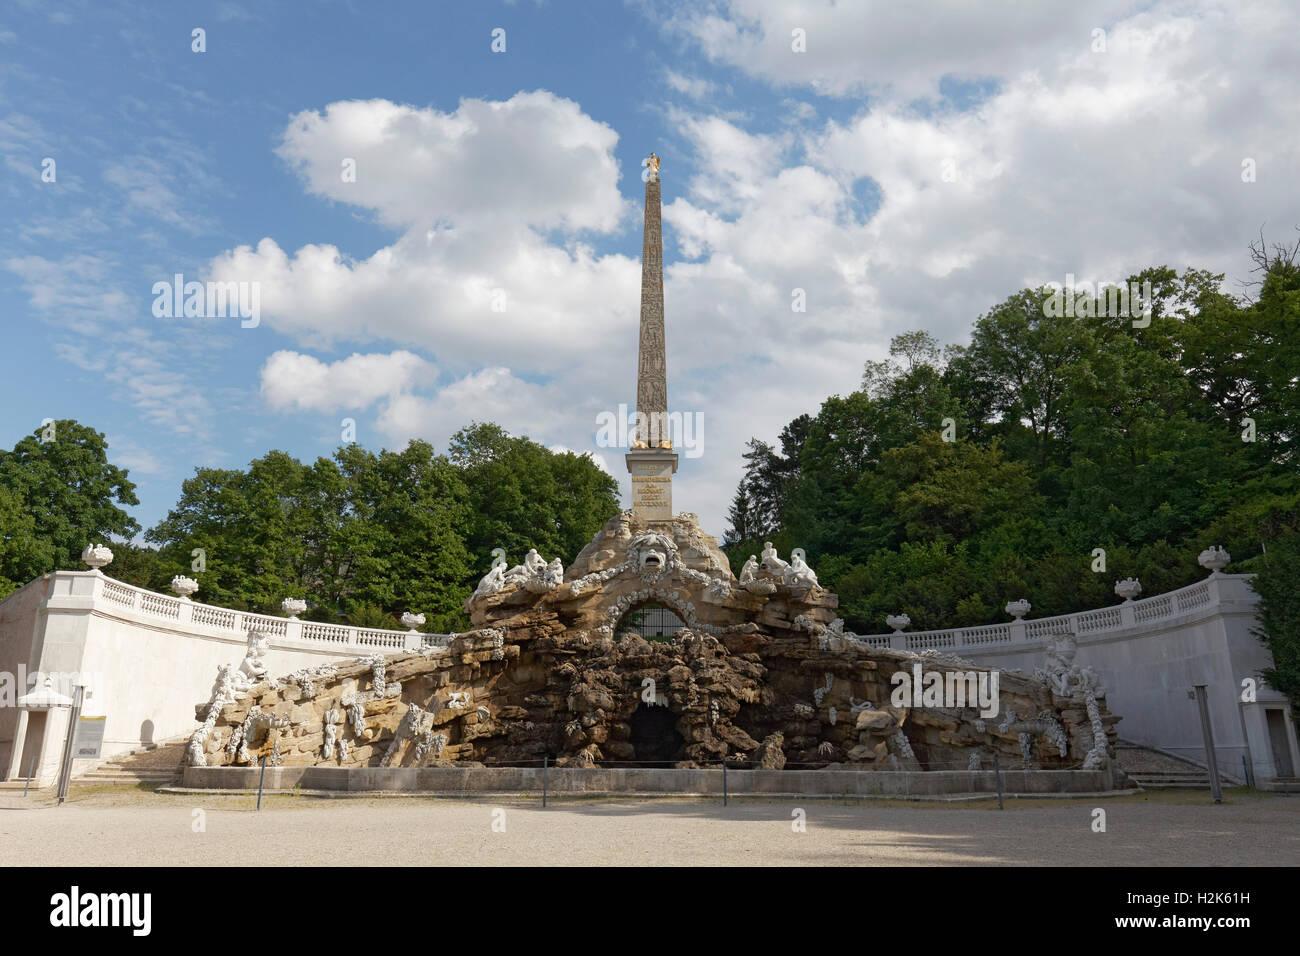 Obelisk Fountain, Schönbrunn Palace, Hietzing, Vienna, Austria - Stock Image